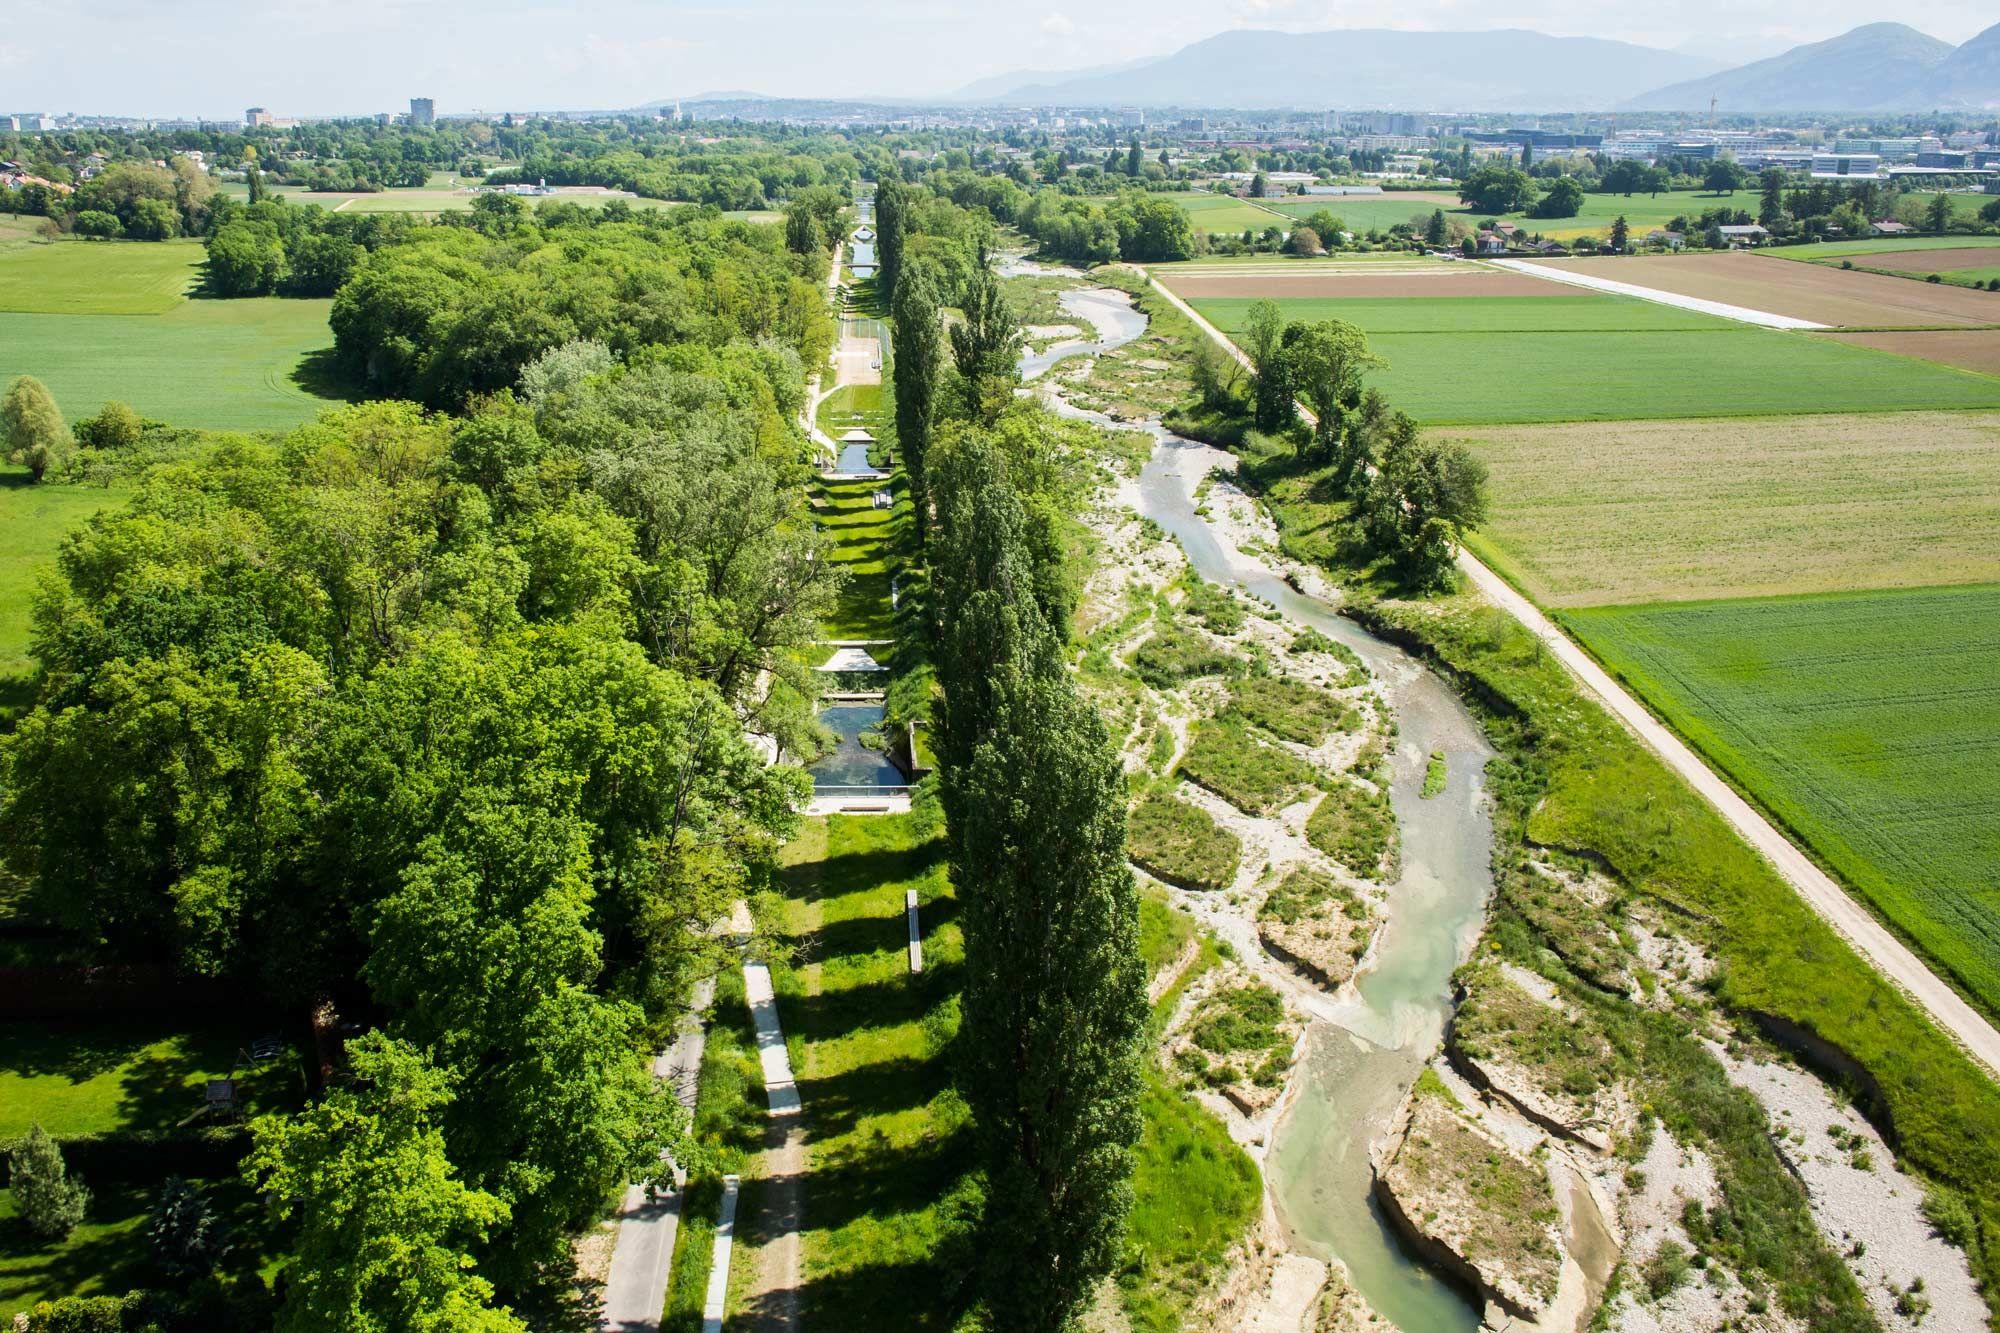 02 Naturalization River Channel Landscape Architecture Fabio Chironi Landscape Architectur Contemporary Landscape Design Landscape Design Landscape Architect